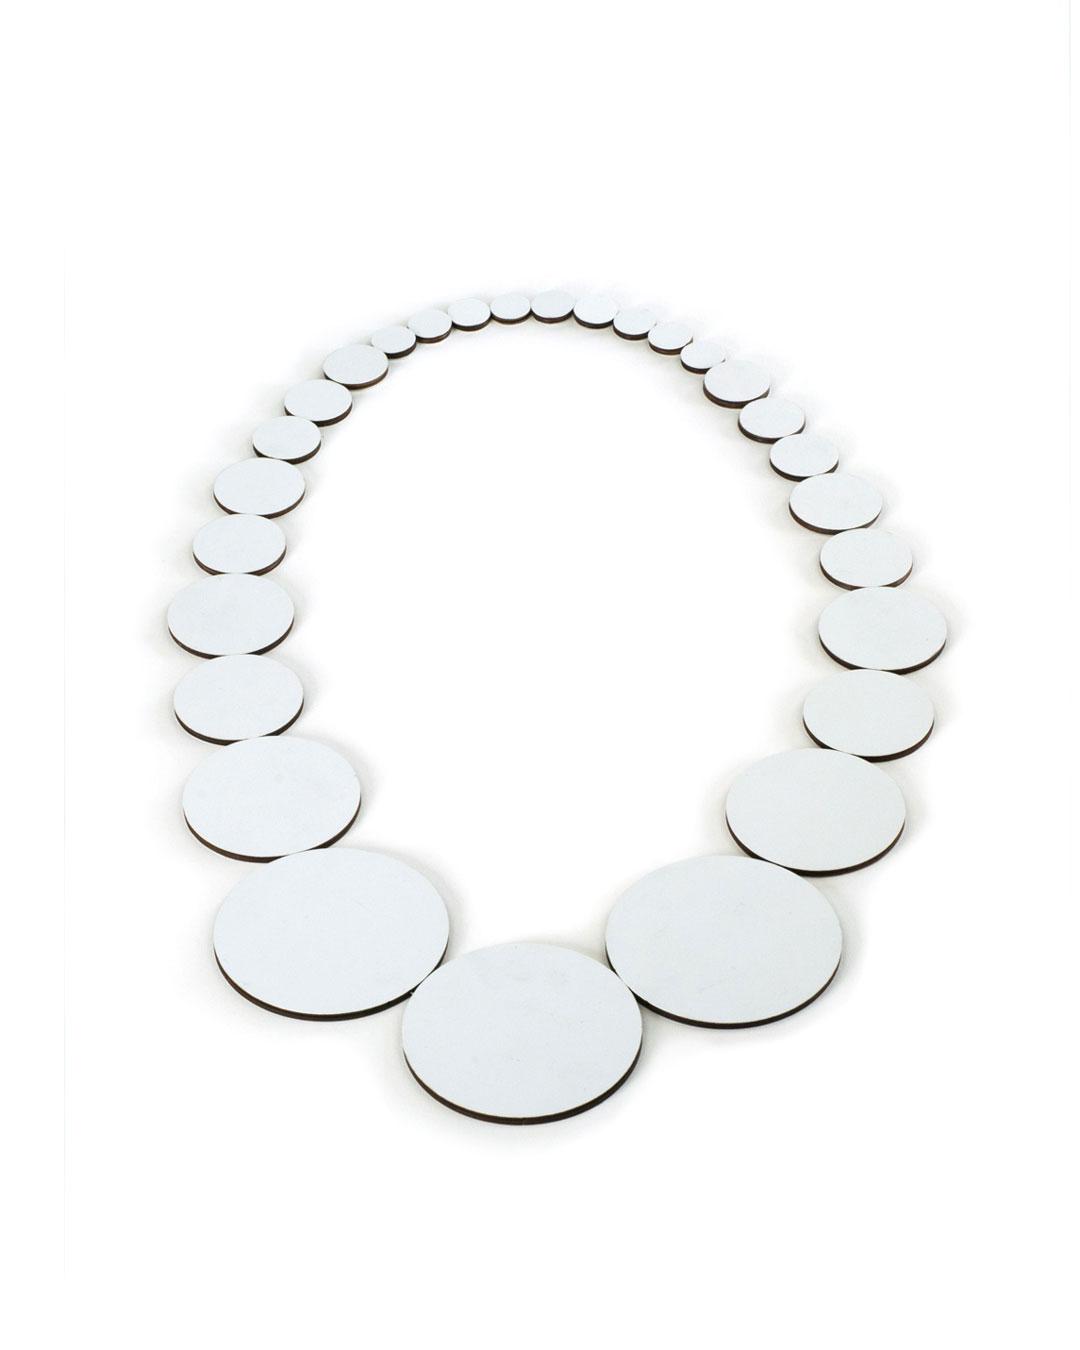 Rebecca Hannon, Flat Pearls, 2013, neckpiece; laminate, 300 x 220 x 2 mm, €850